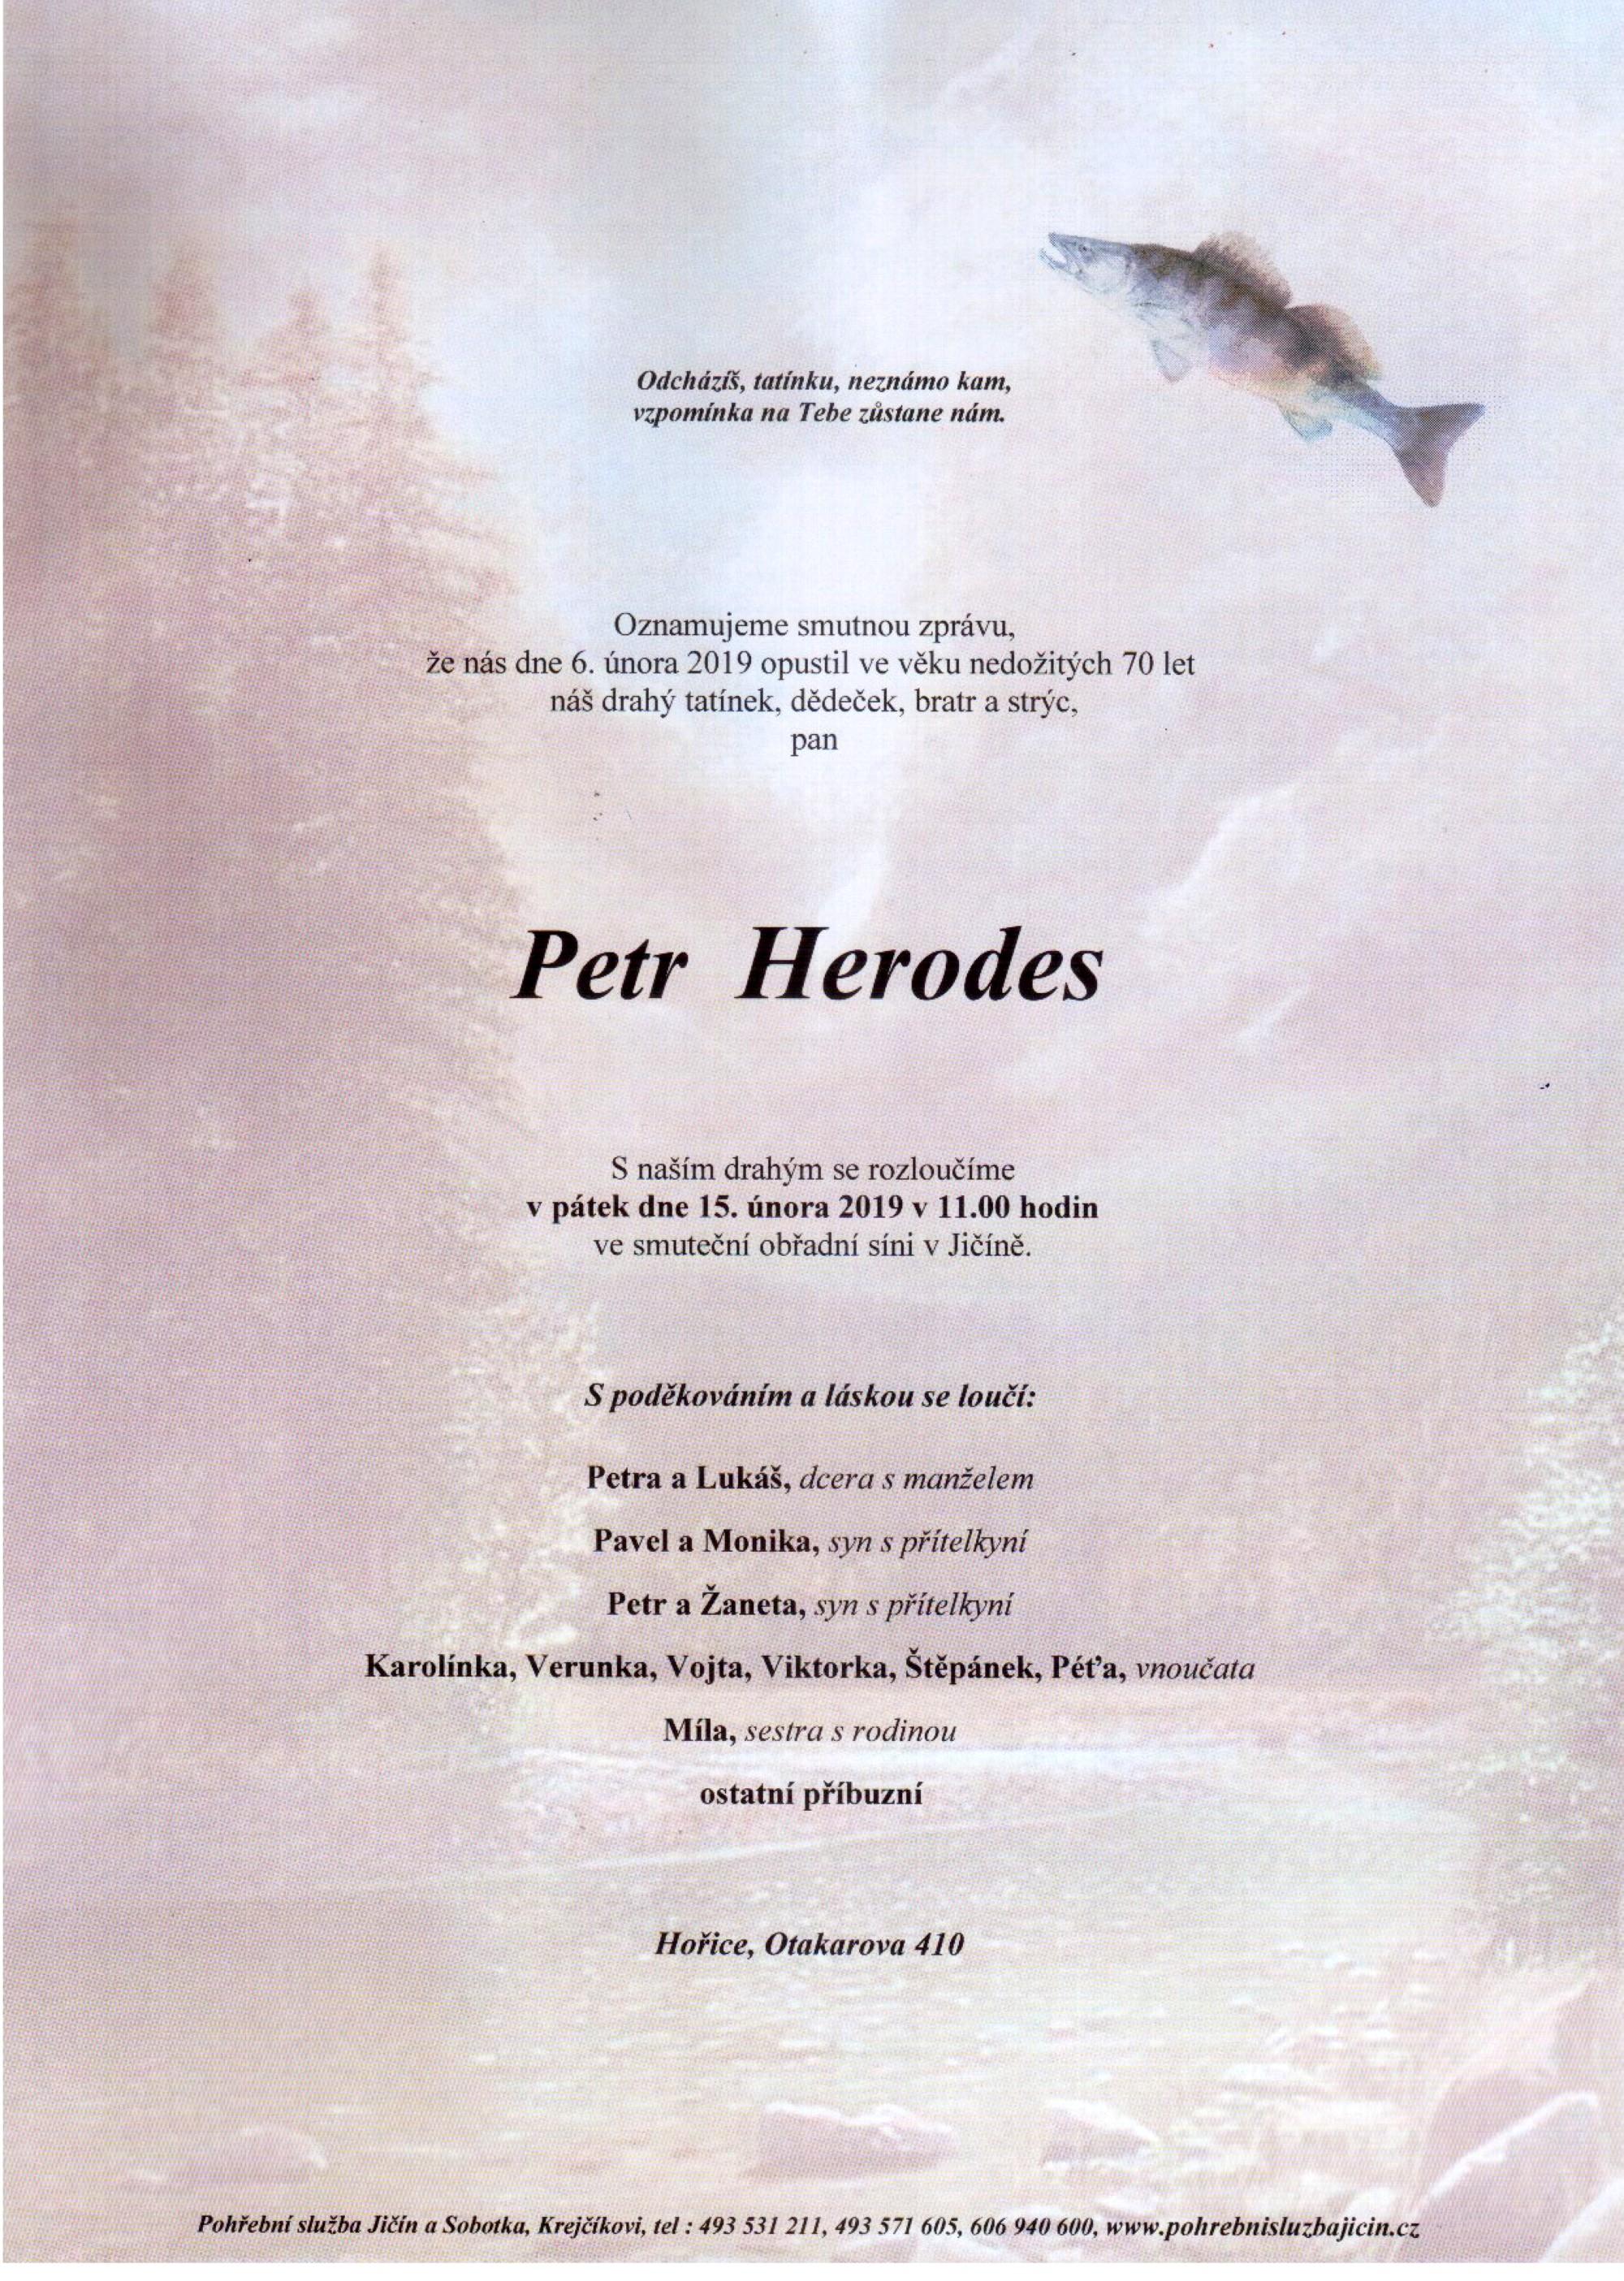 Petr Herodes